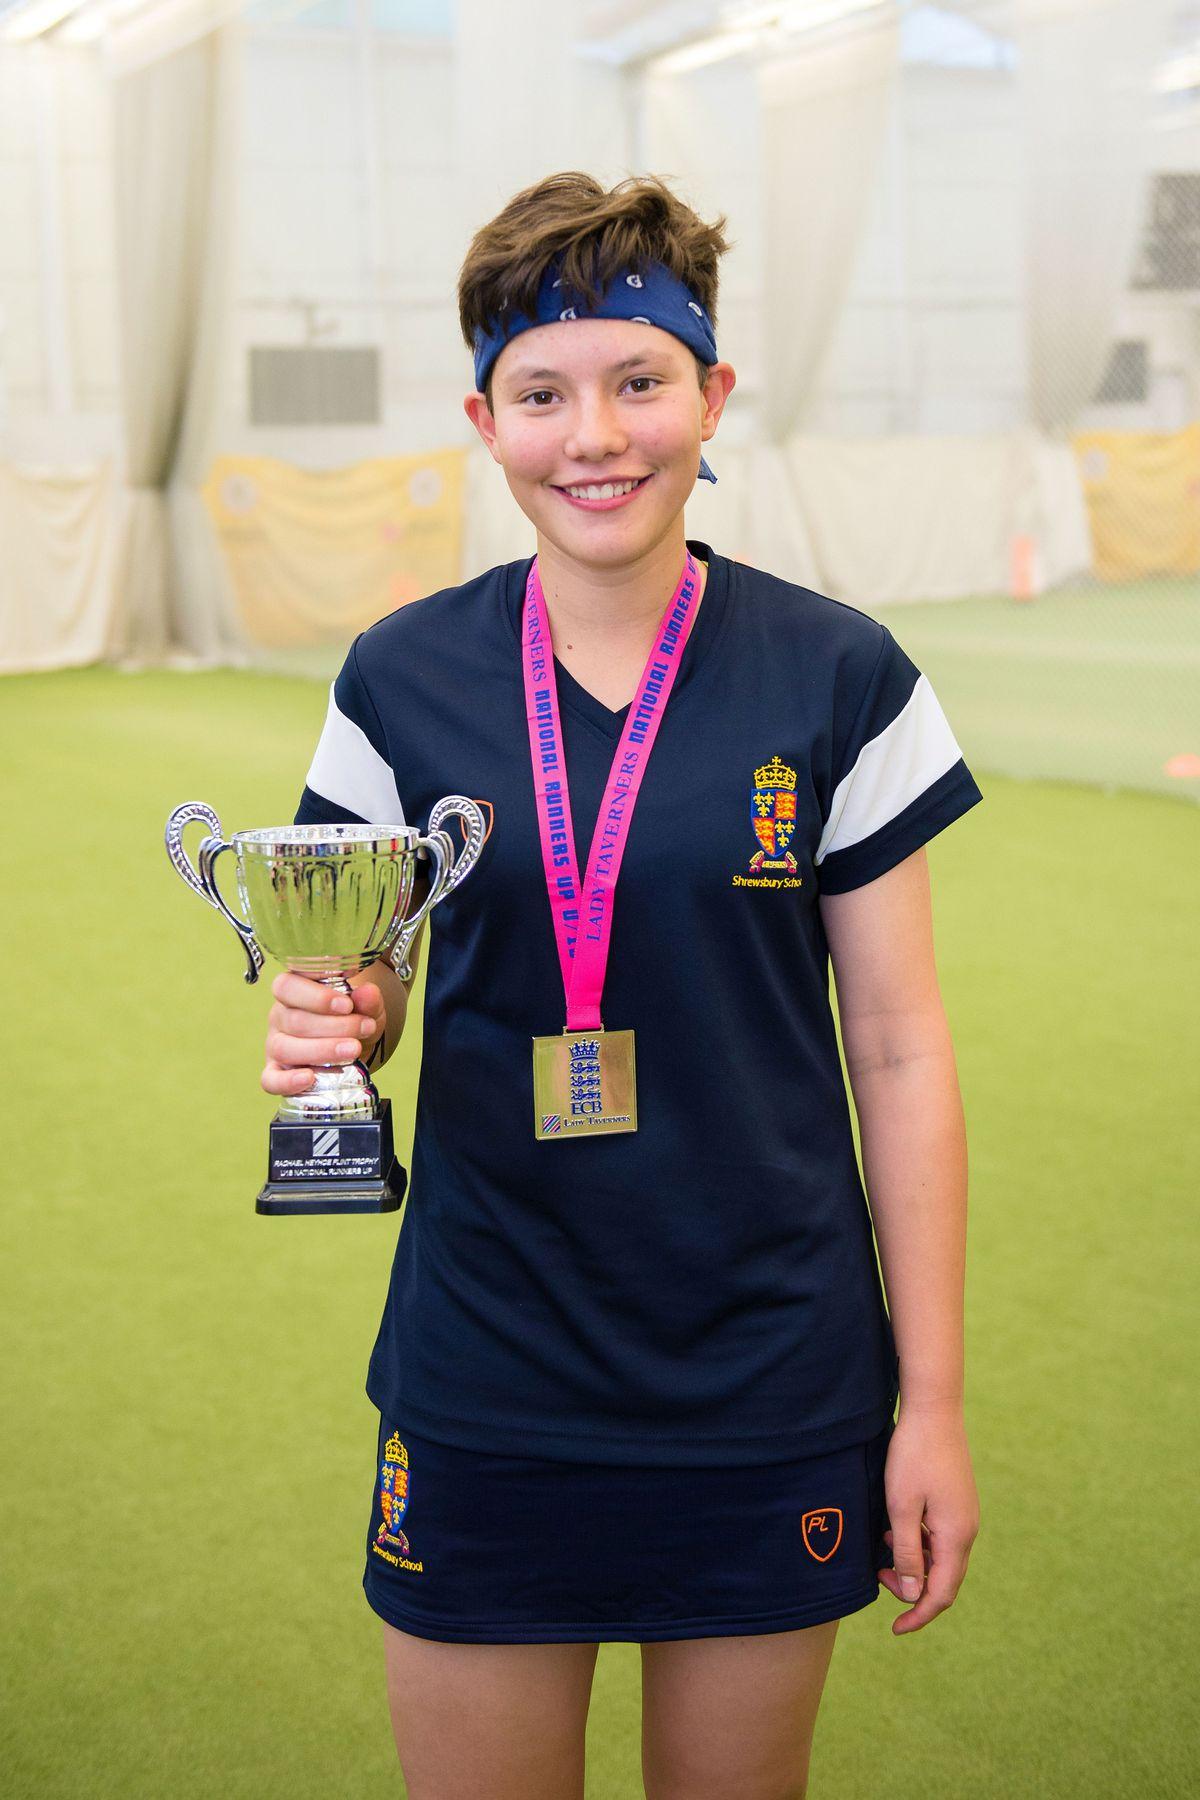 Shropshire's Issy Wong nets an England call | Shropshire Star